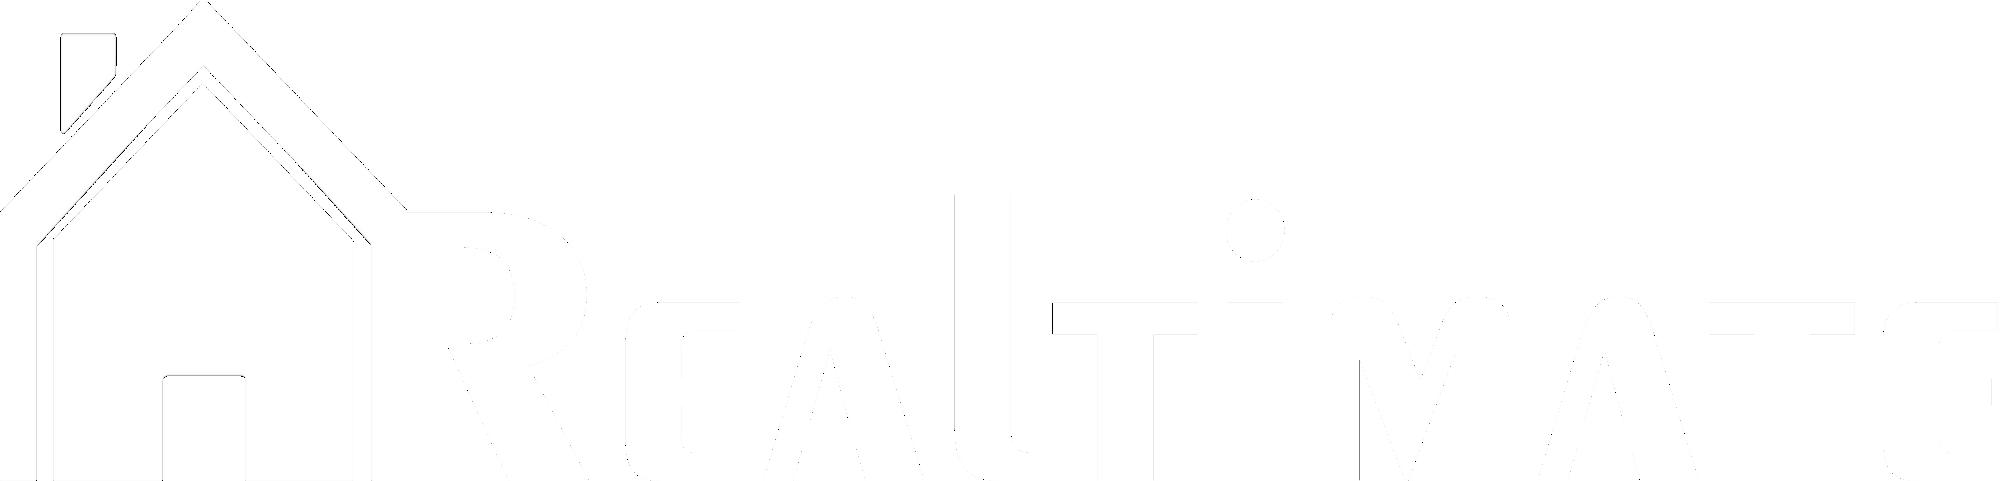 Realtimate.com